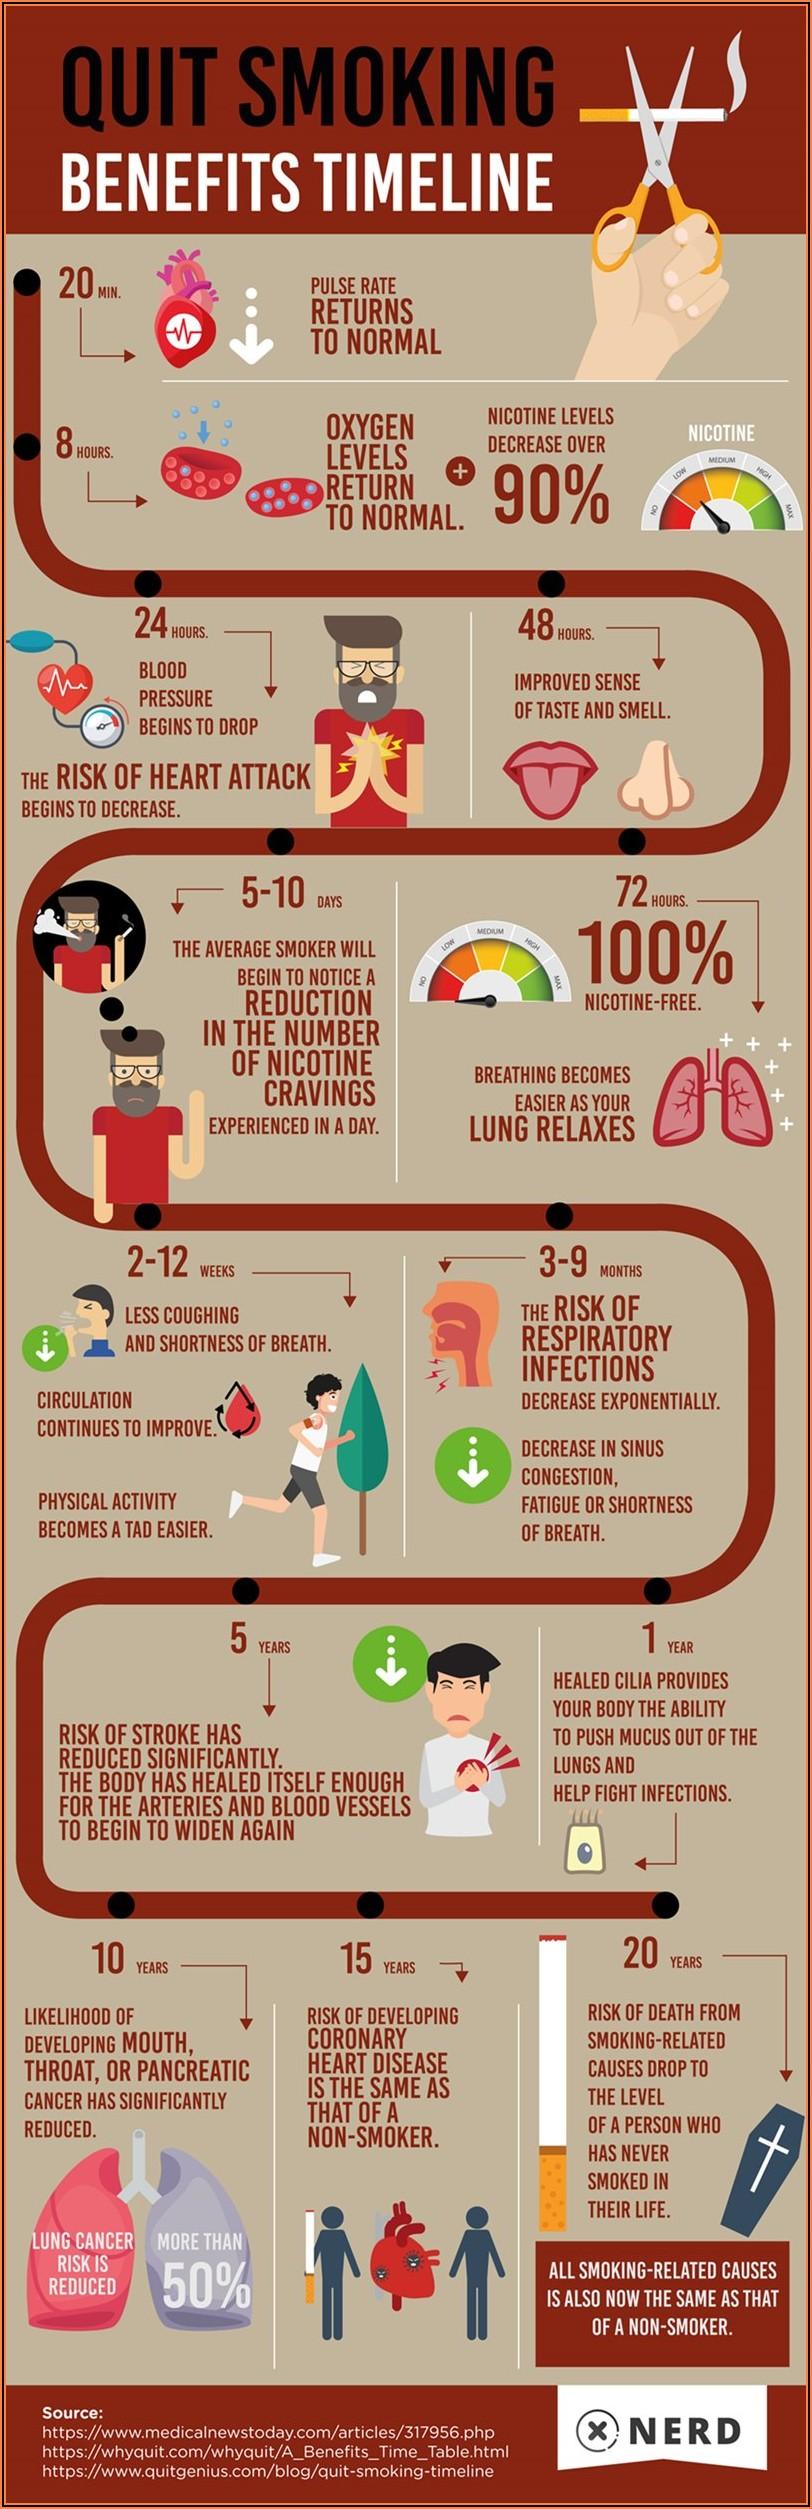 Smoking Cessation Detailed Timeline